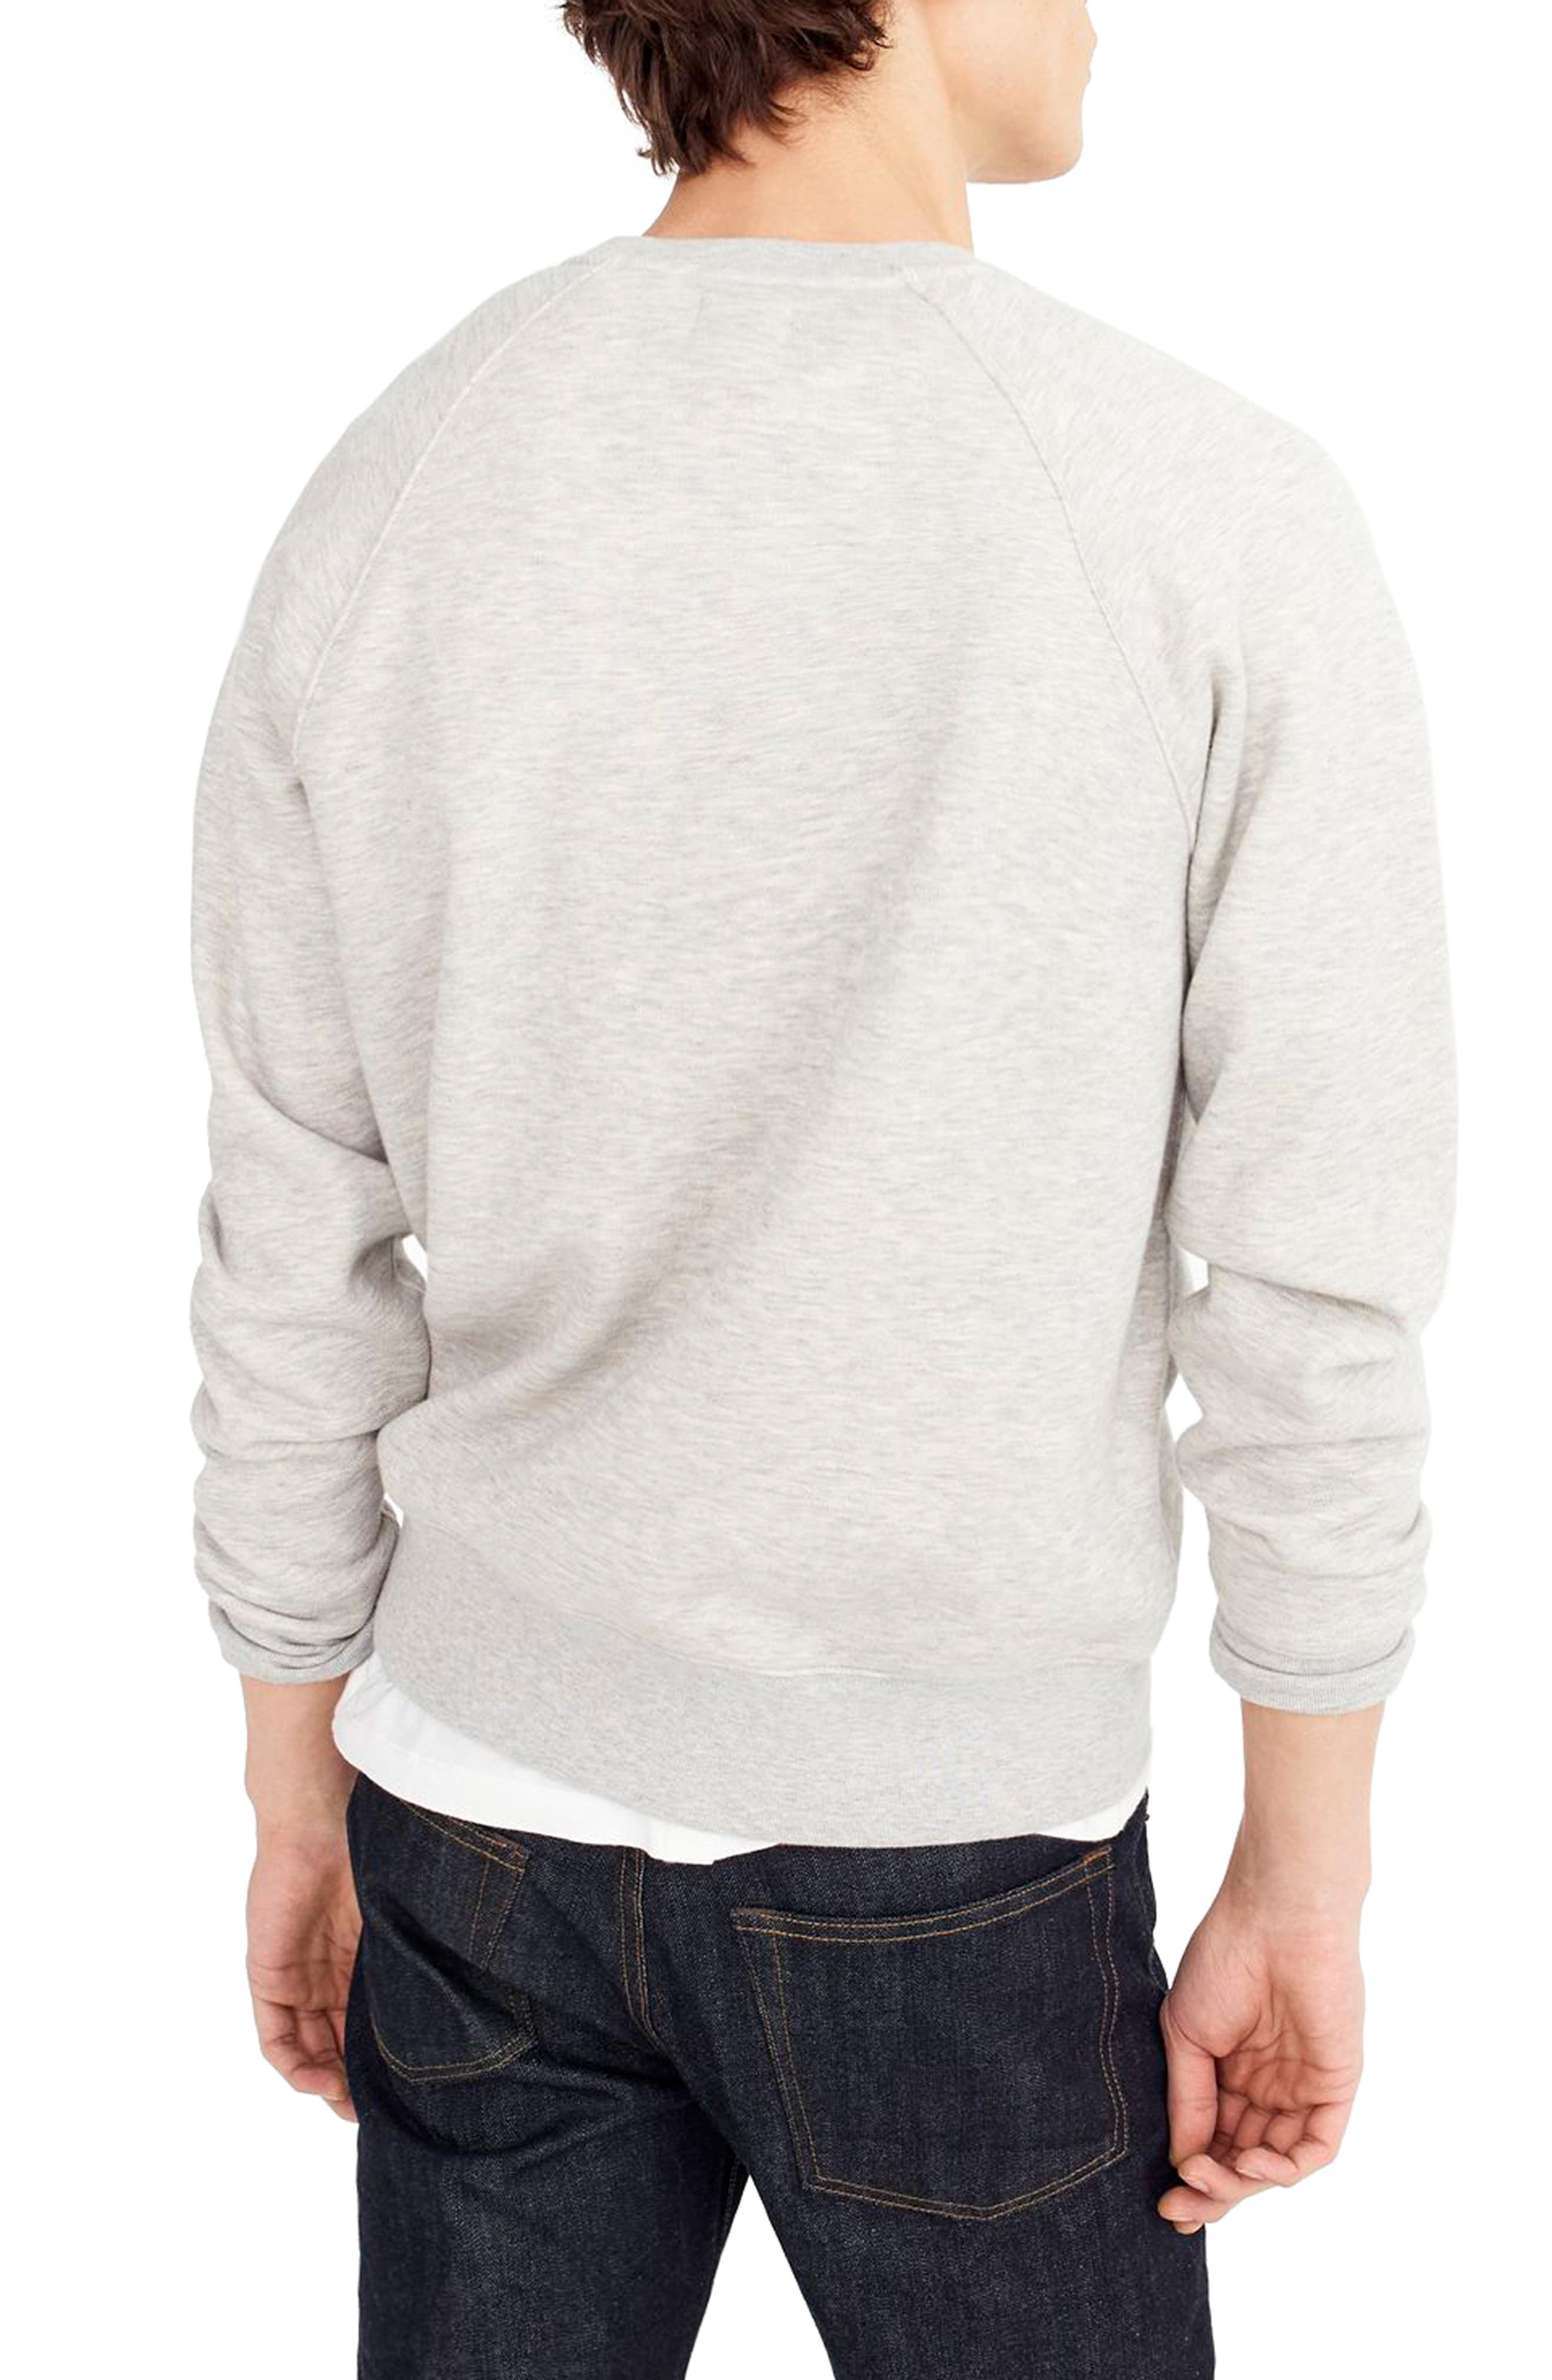 Textured Piqué Fleece Sweatshirt,                             Alternate thumbnail 2, color,                             020